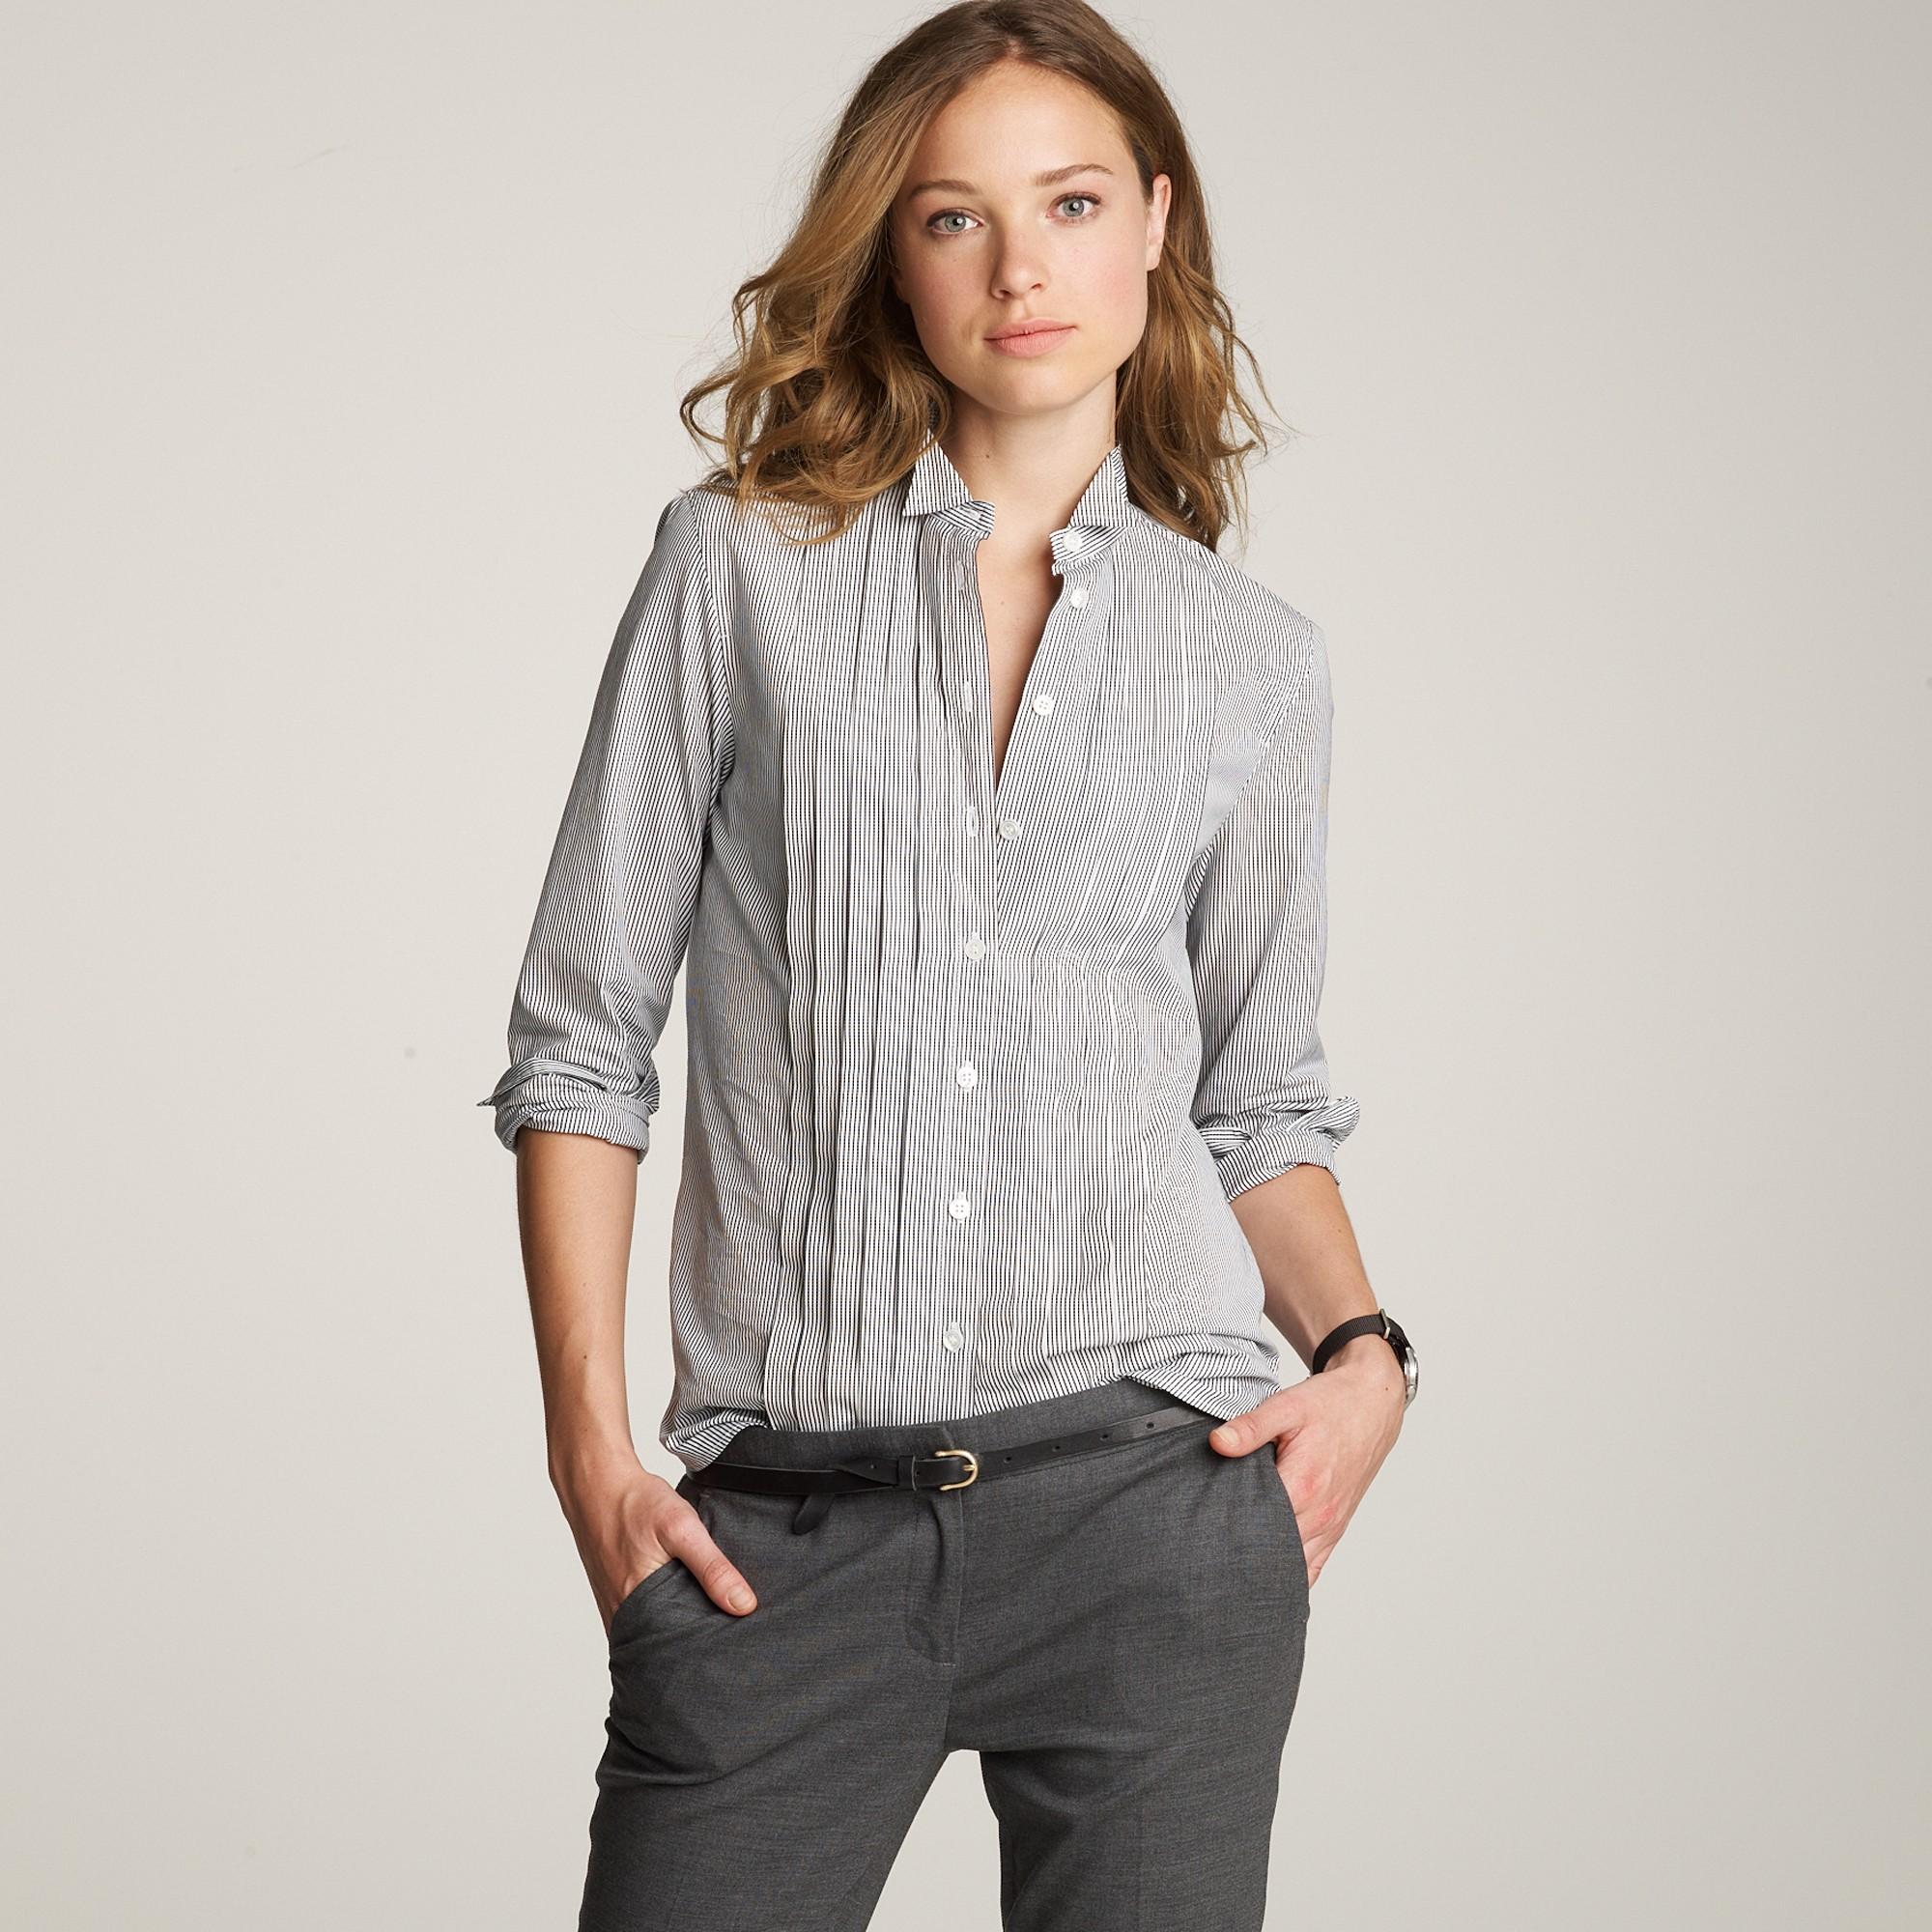 Lyst - Thomas Mason Printed Tuxedo Shirt in Gray 43c4b2e20